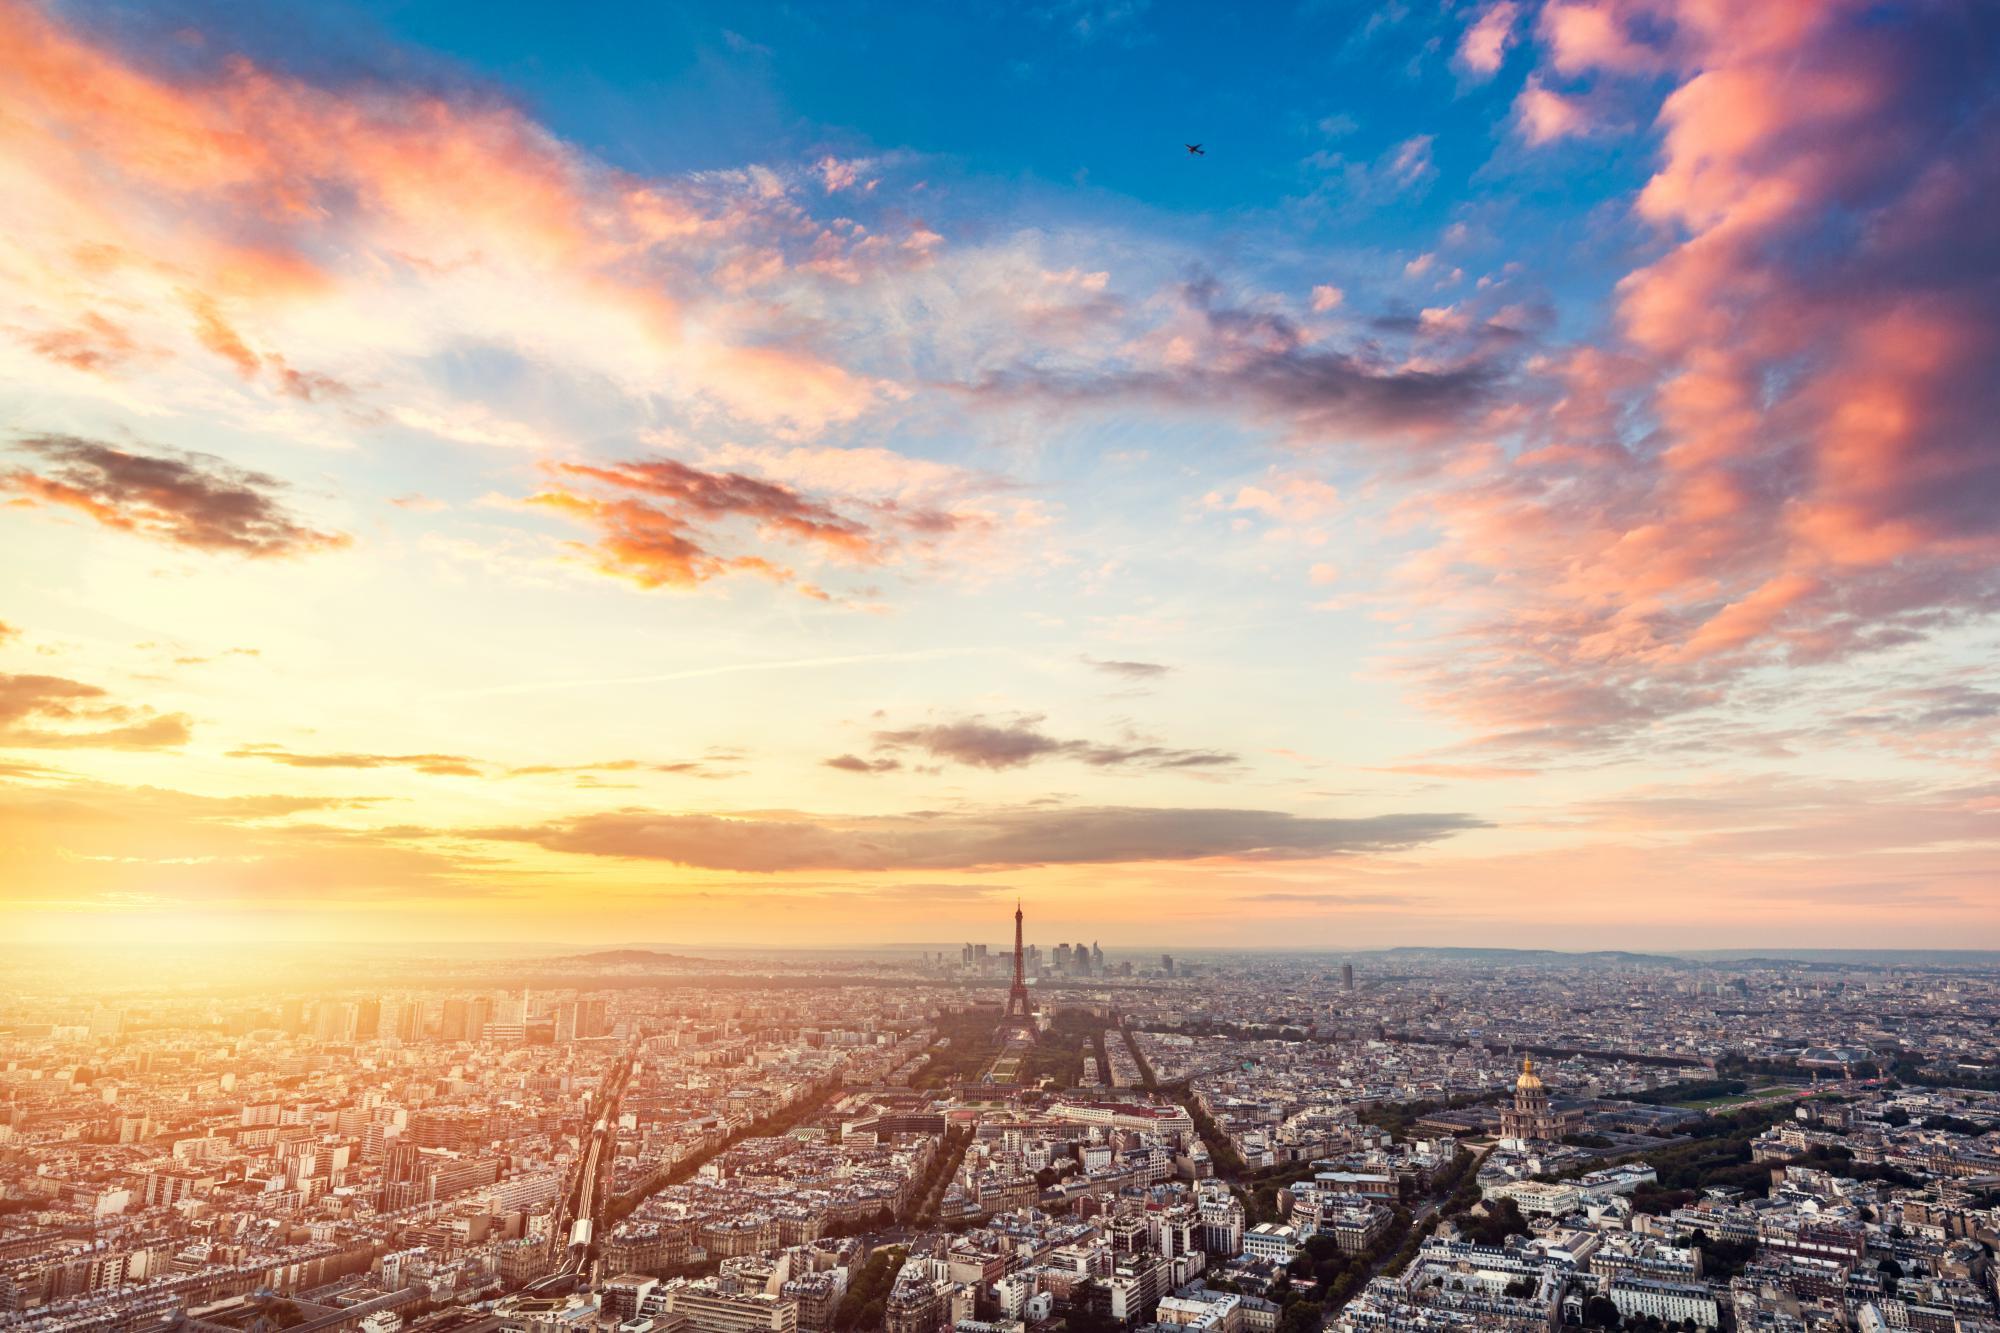 Франция планирует начать сбор налога на цифровые услуги в конце 2020 года